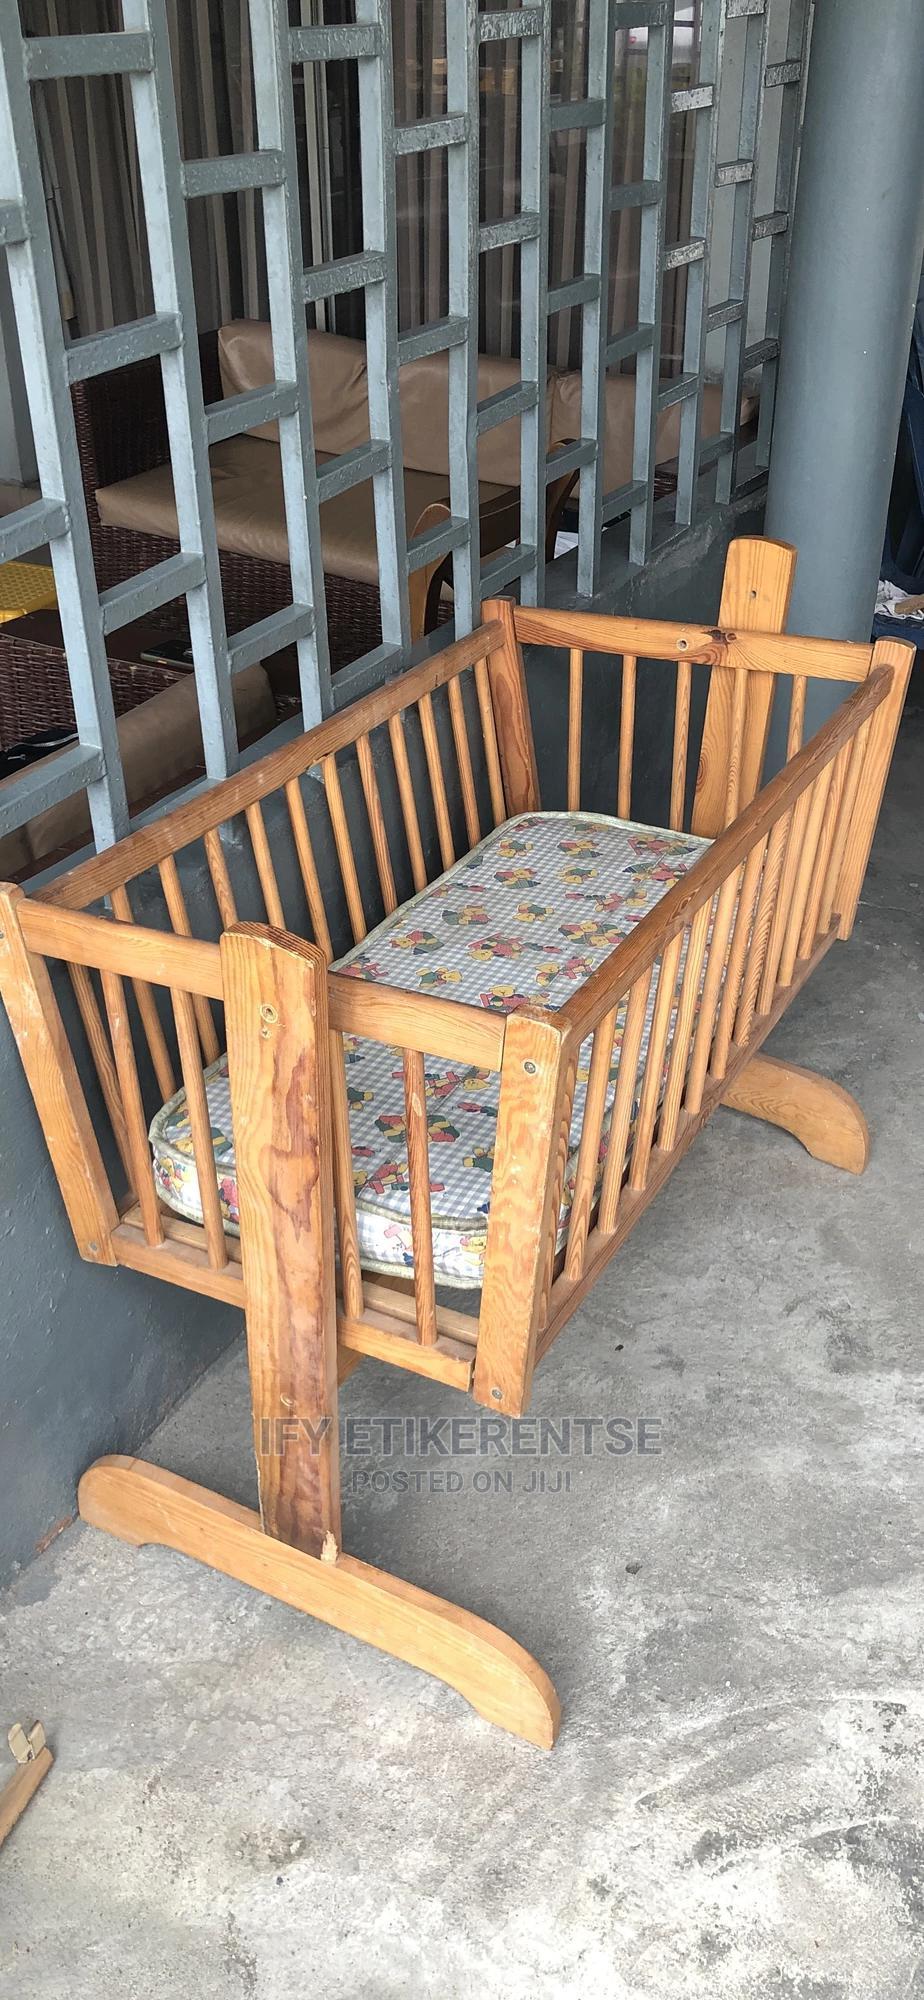 Archive: Baby Crib and Mattress